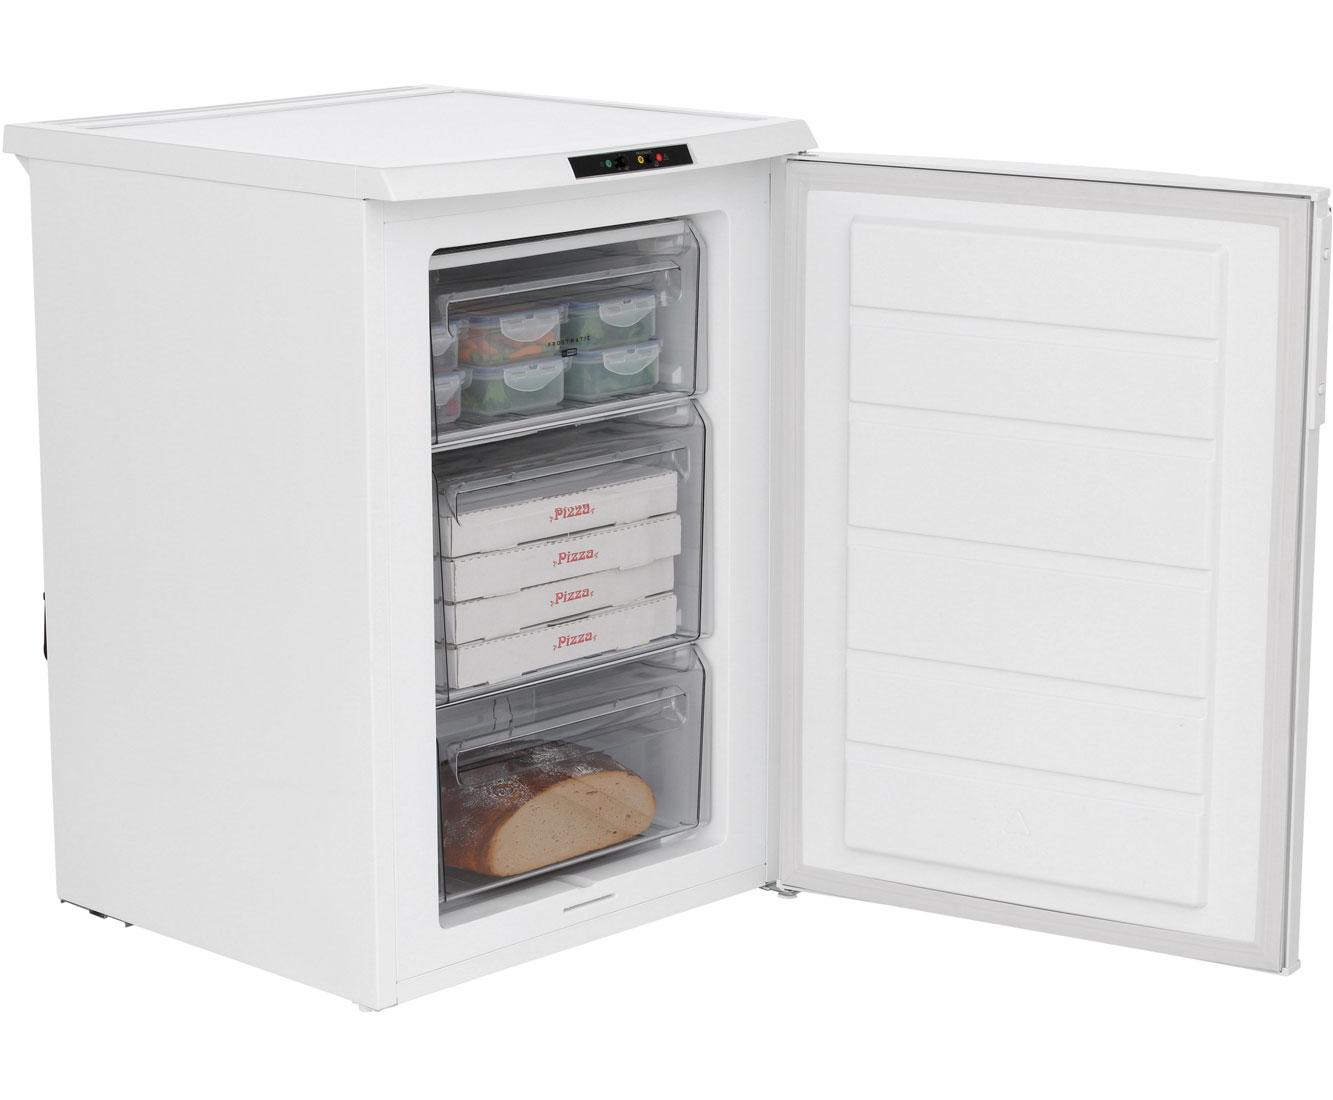 Aeg Kühlschrank Temperatur : Unsere besten gefrierschränke bequem bestellen bei ao.de